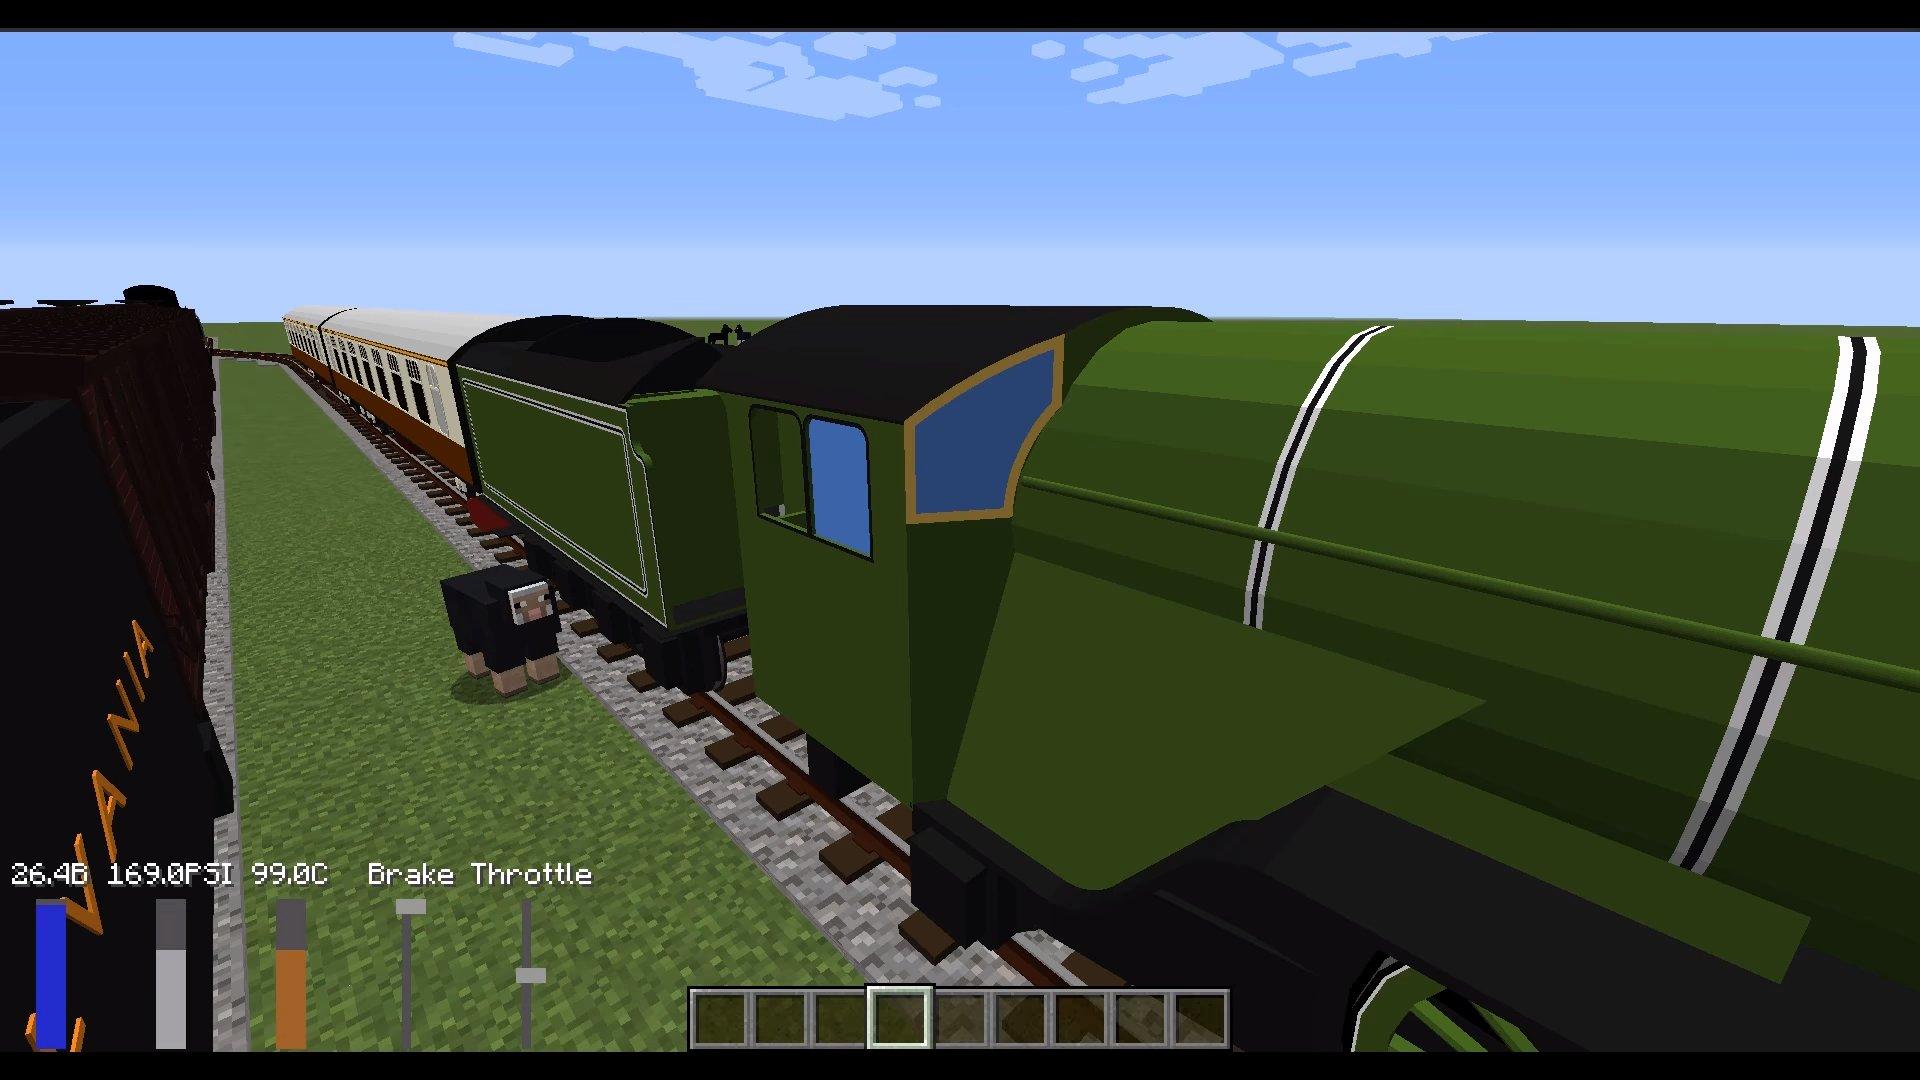 1 12 2] Immersive Railroading Mod Download | Minecraft Forum